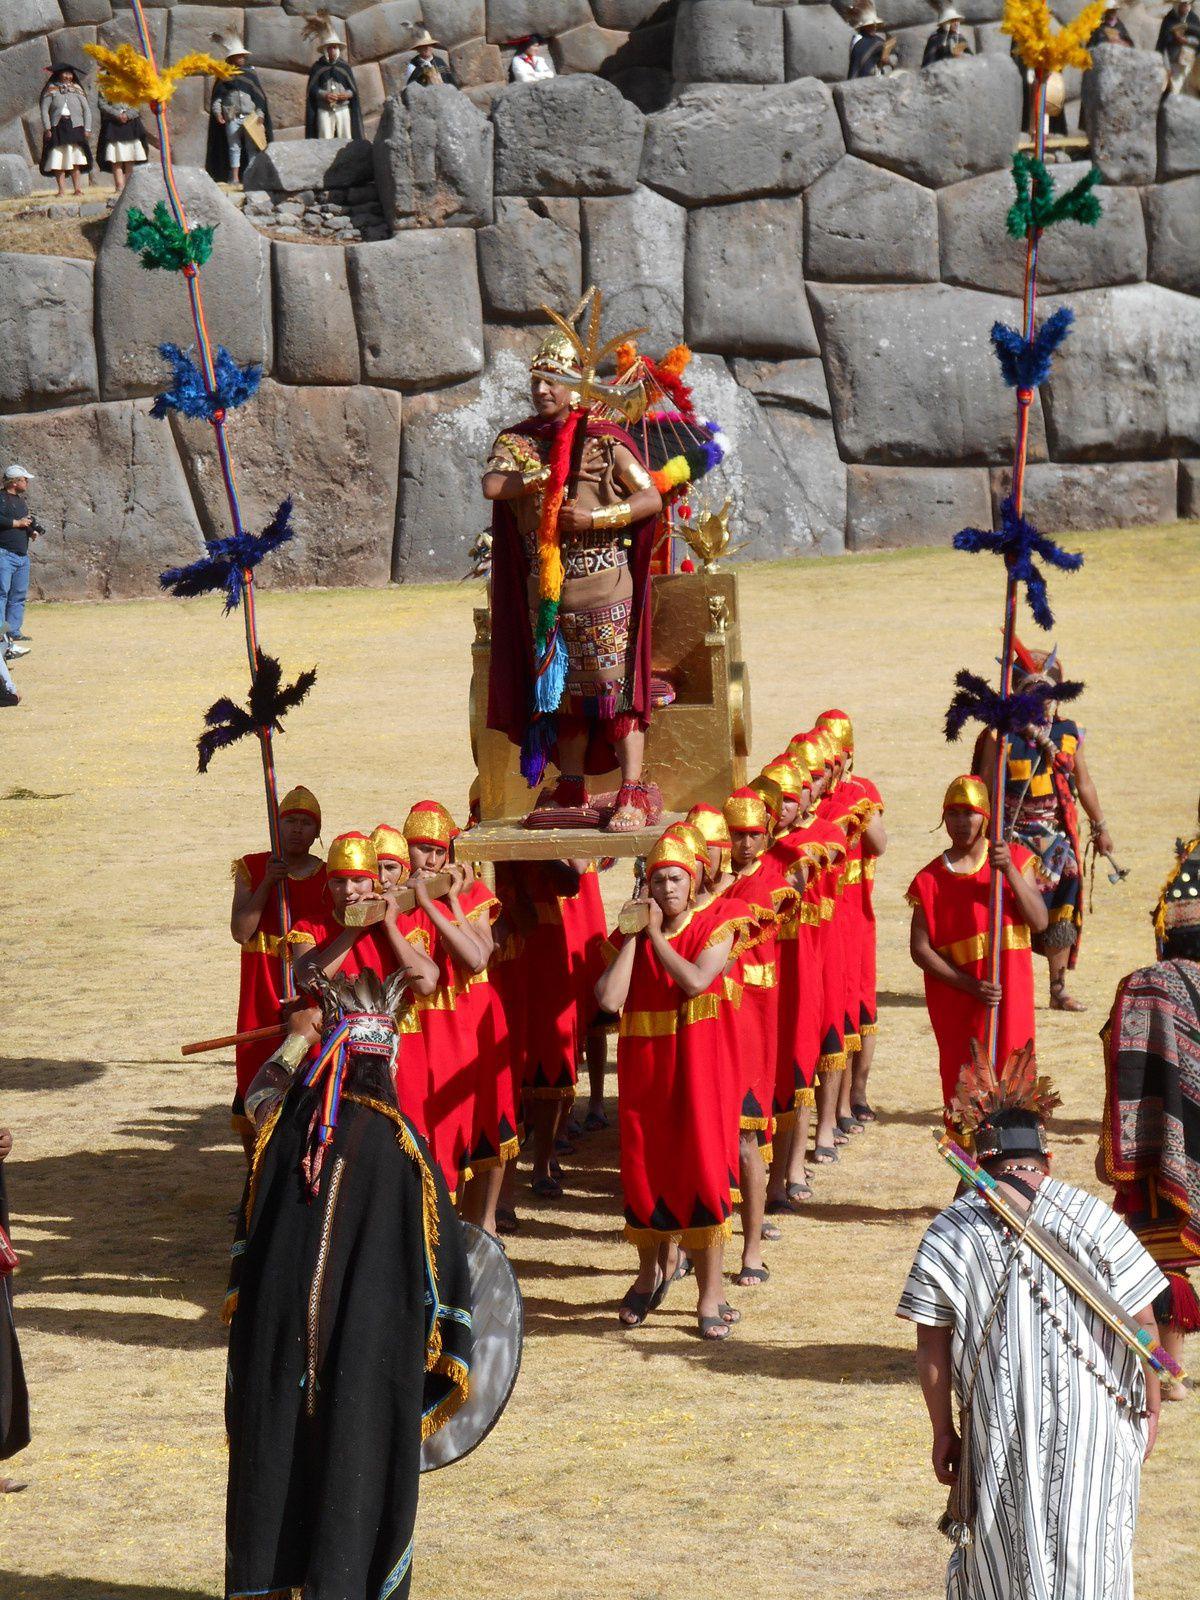 Le roi Inca se fait porter par quatre groupes représentant les quatre régions qui formaient l'empire inca : Qollasuyu, Kuntisuyu, Antisuyu y Chinchaysuyu.